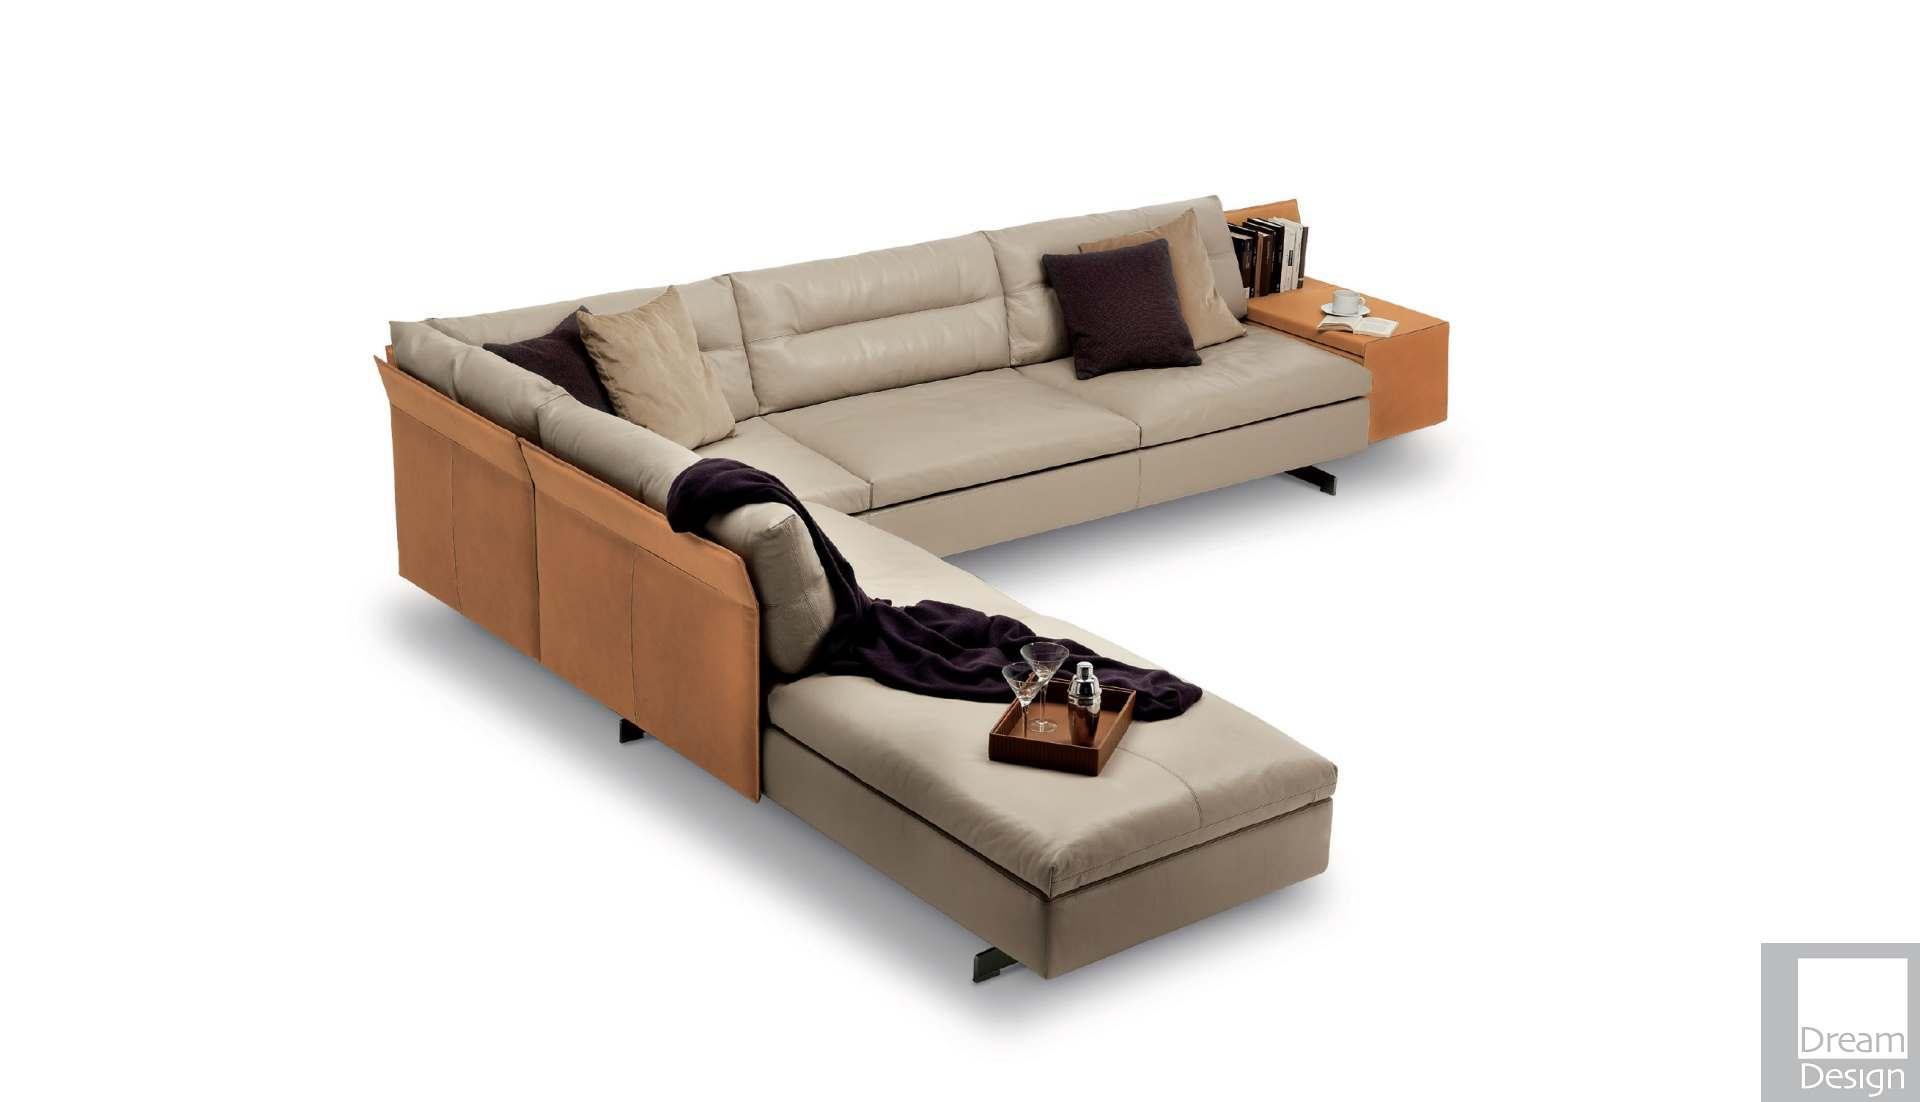 Poltrona frau grantorino sofa dream design interiors ltd for Sofa dreams